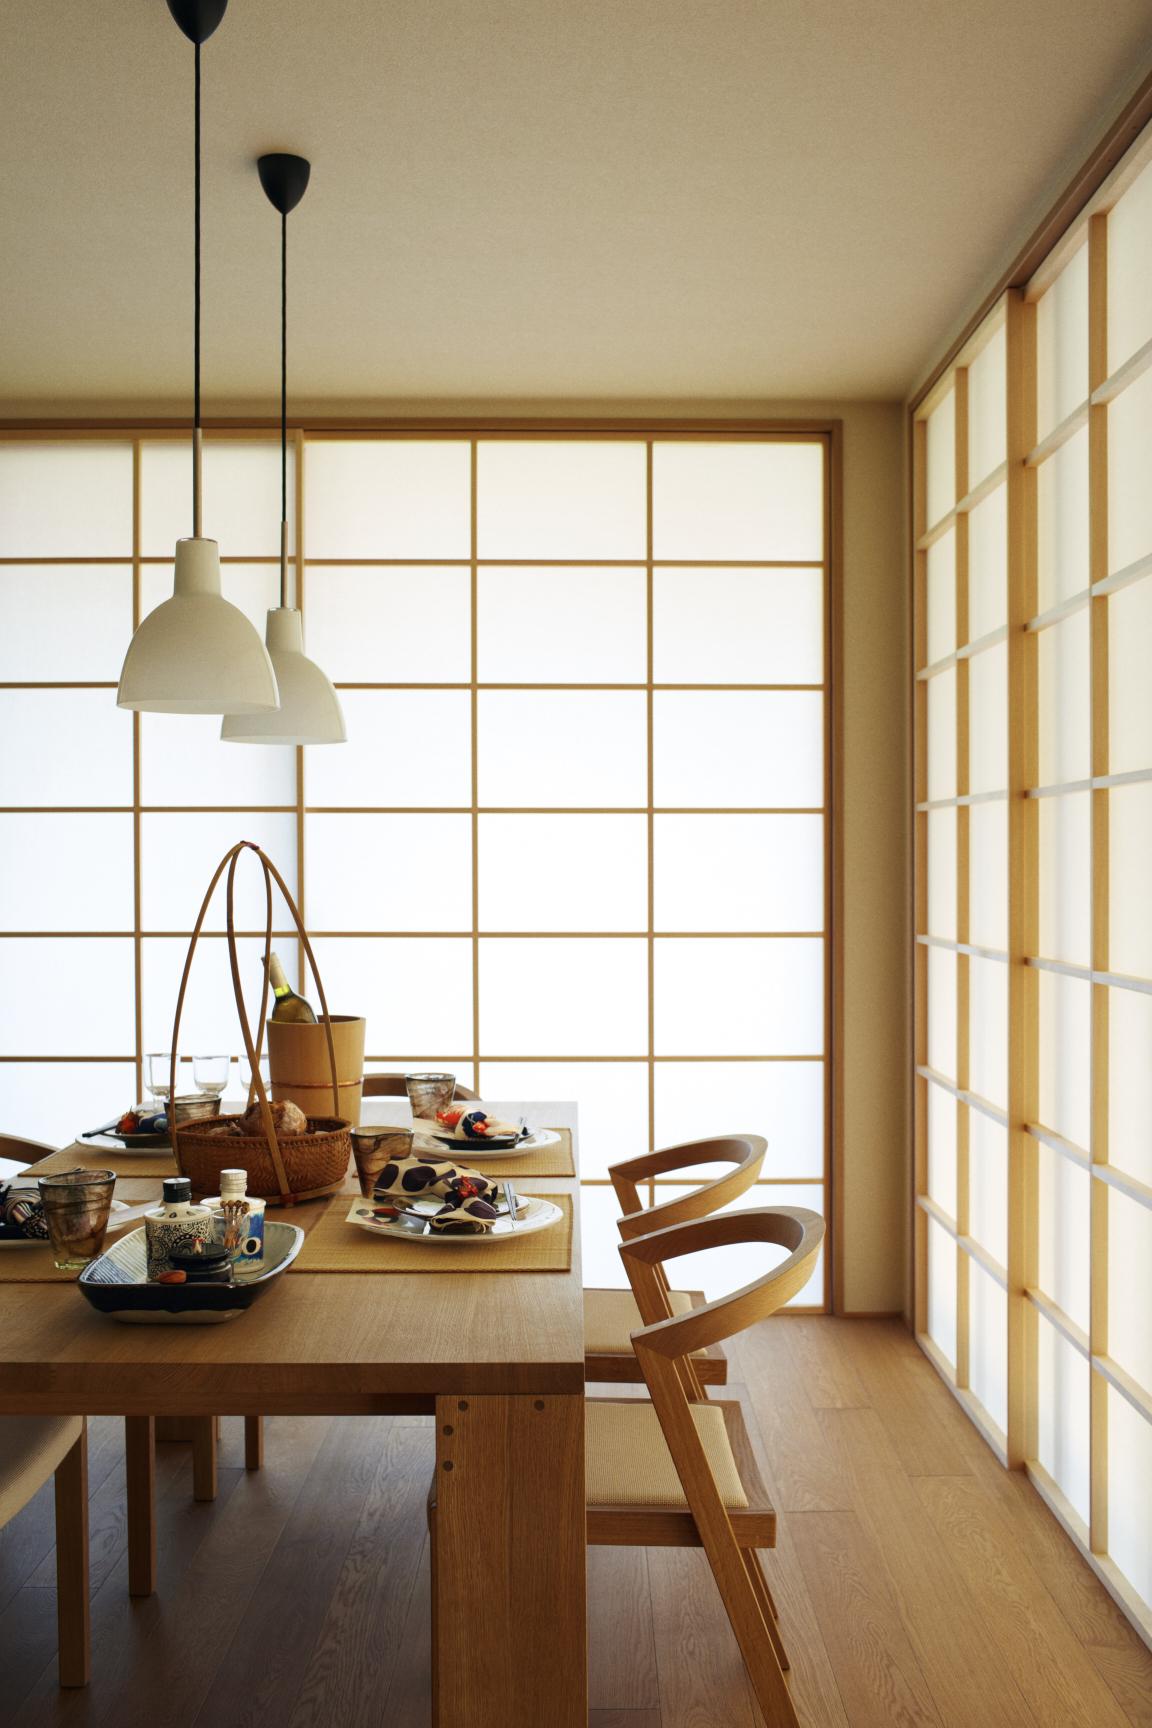 hebel haus style stories mitsuko kuroda laboratoryy. Black Bedroom Furniture Sets. Home Design Ideas